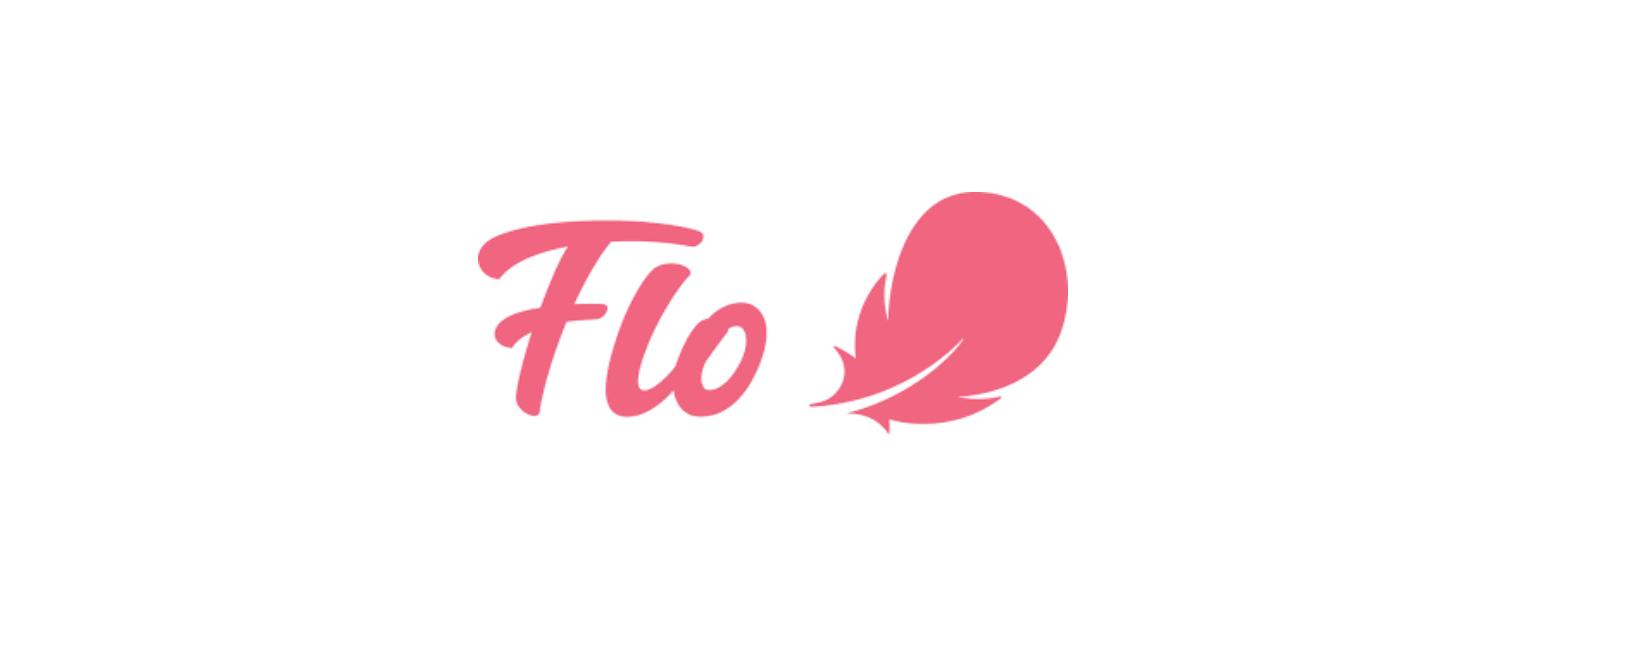 FLO Discount Code 2021